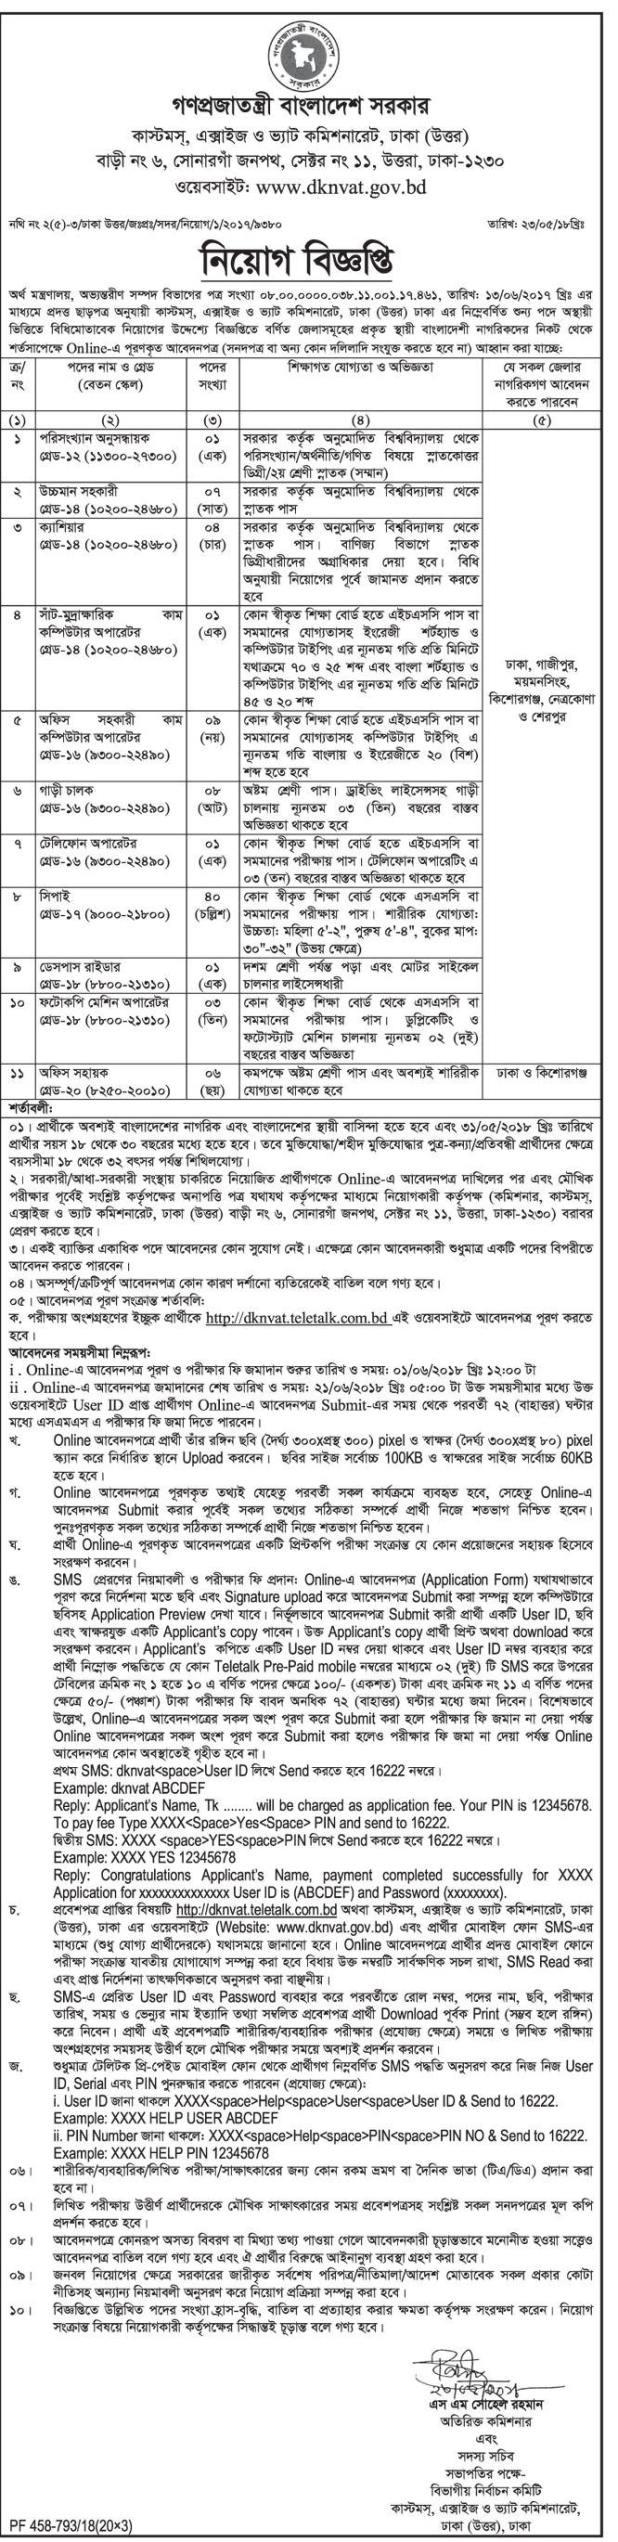 Bangladesh Customs Excise & Vat Commissionerate Job Circular 2018